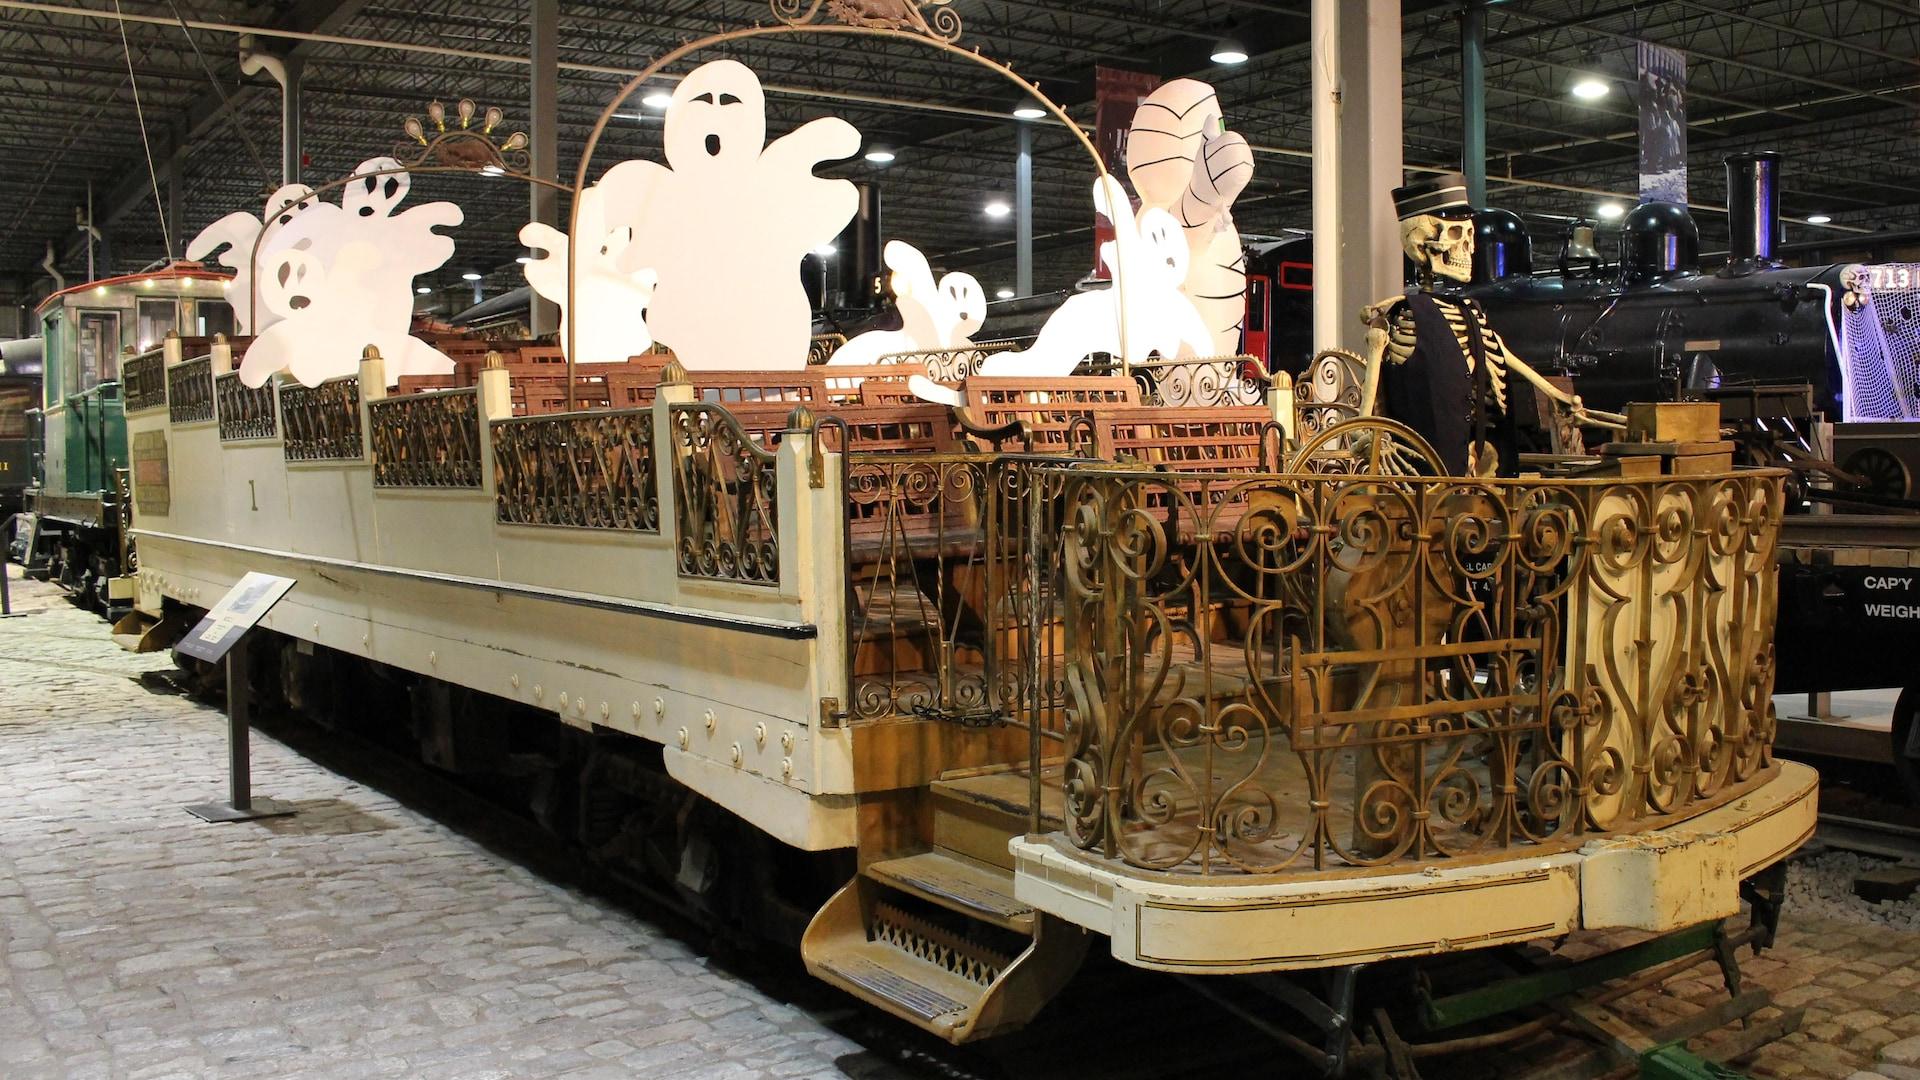 Un train fantôme